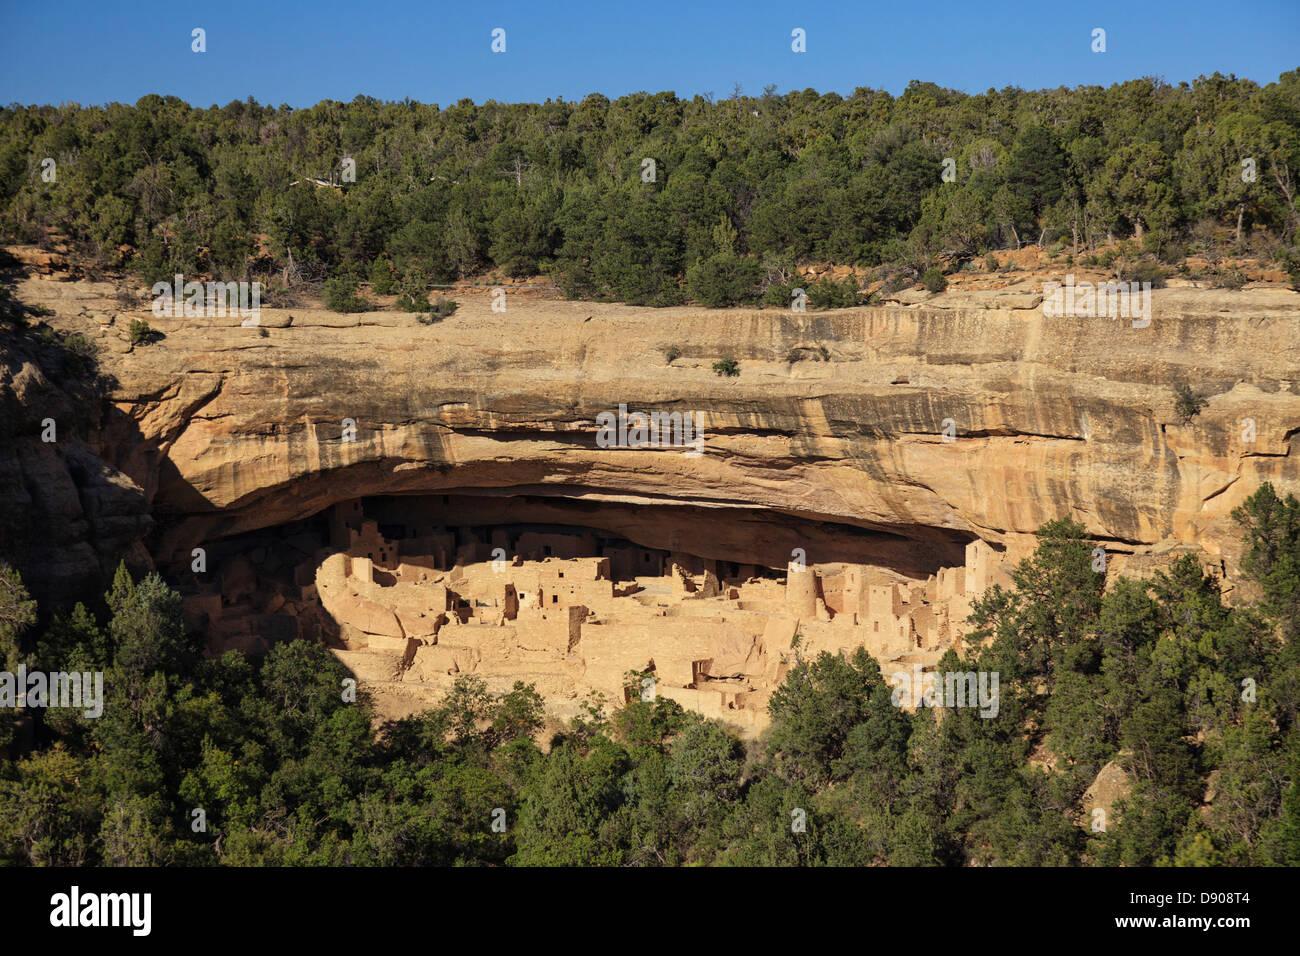 USA, Colorado, Mesa Verde National Park (UNESCO Heritage), Spruce Tree House Cliff dwellings - Stock Image